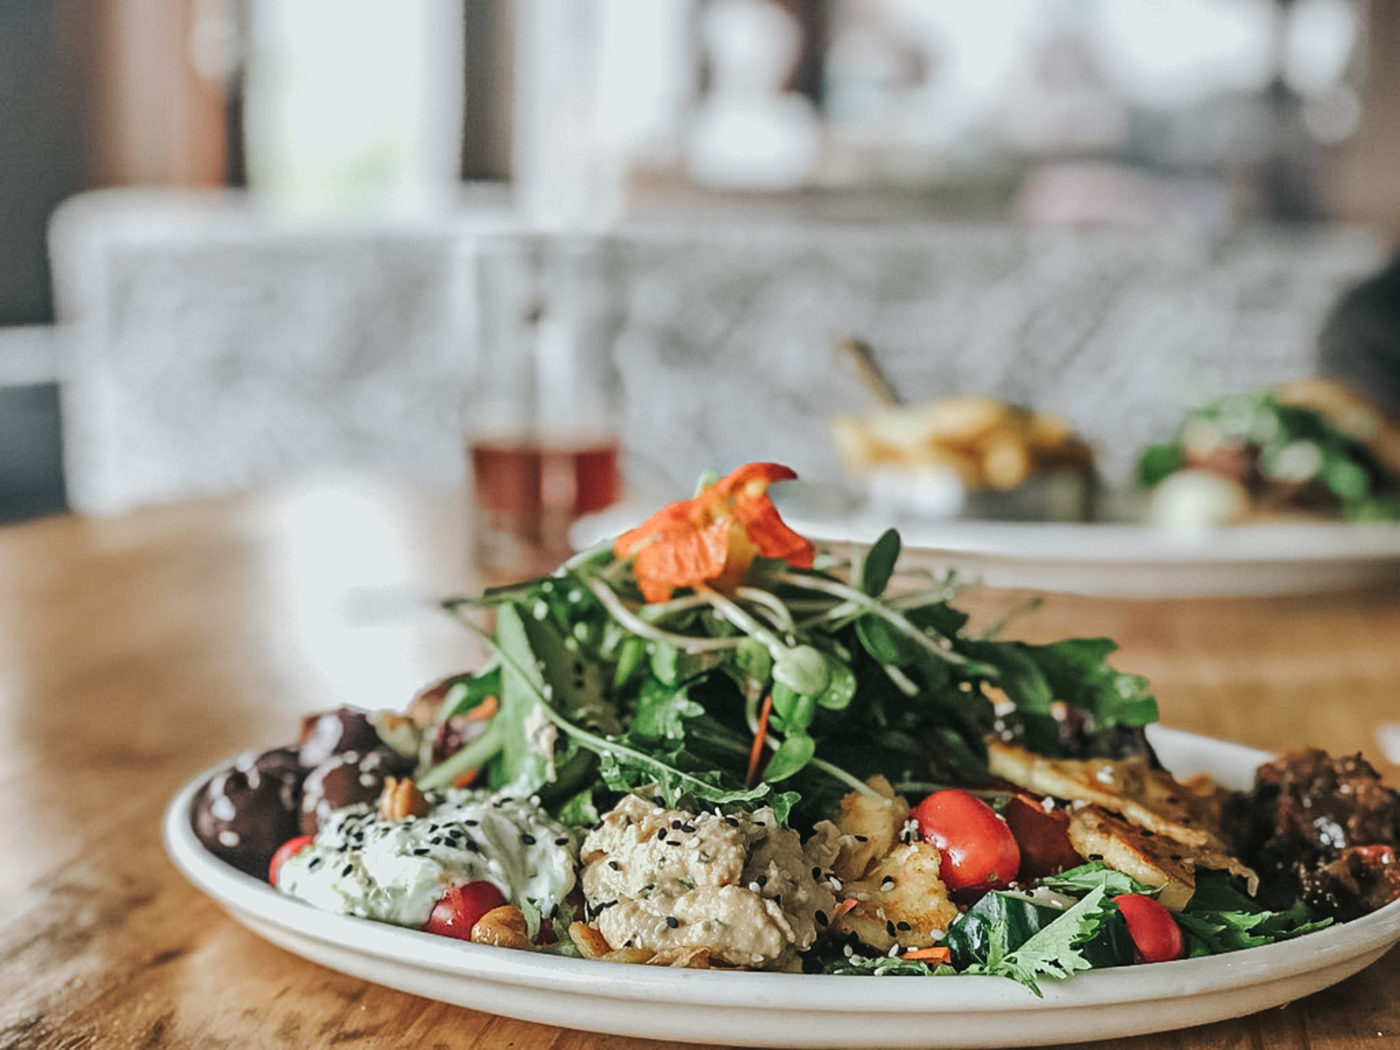 Vegan salad at Nina's Real Food in Jeffrey's Bay